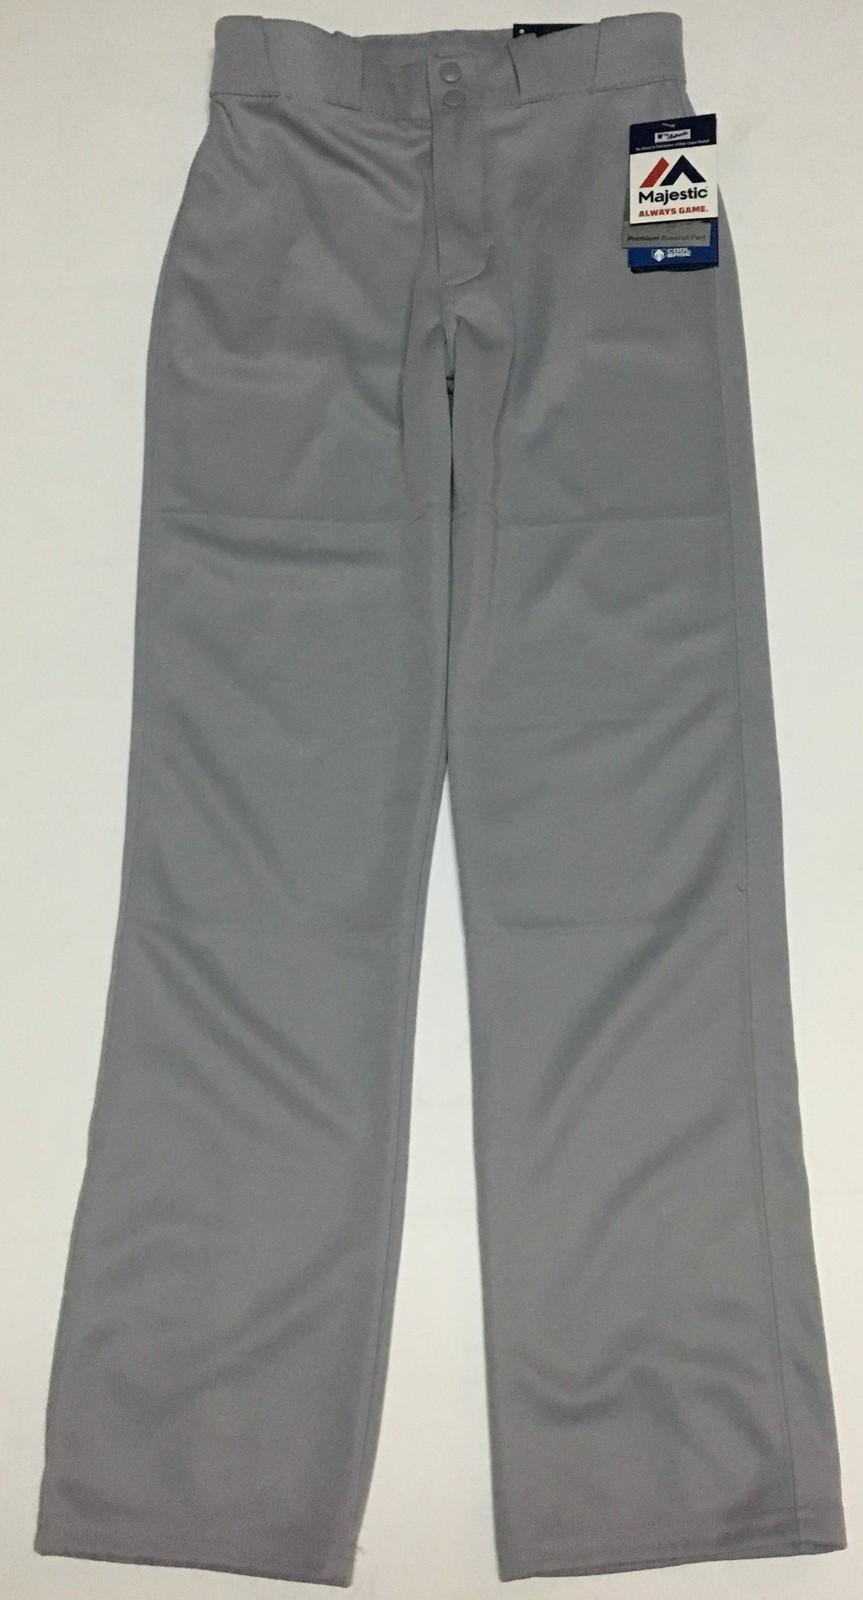 Majestic Gray Baseball Pants NWT Sz Youth M Boy's